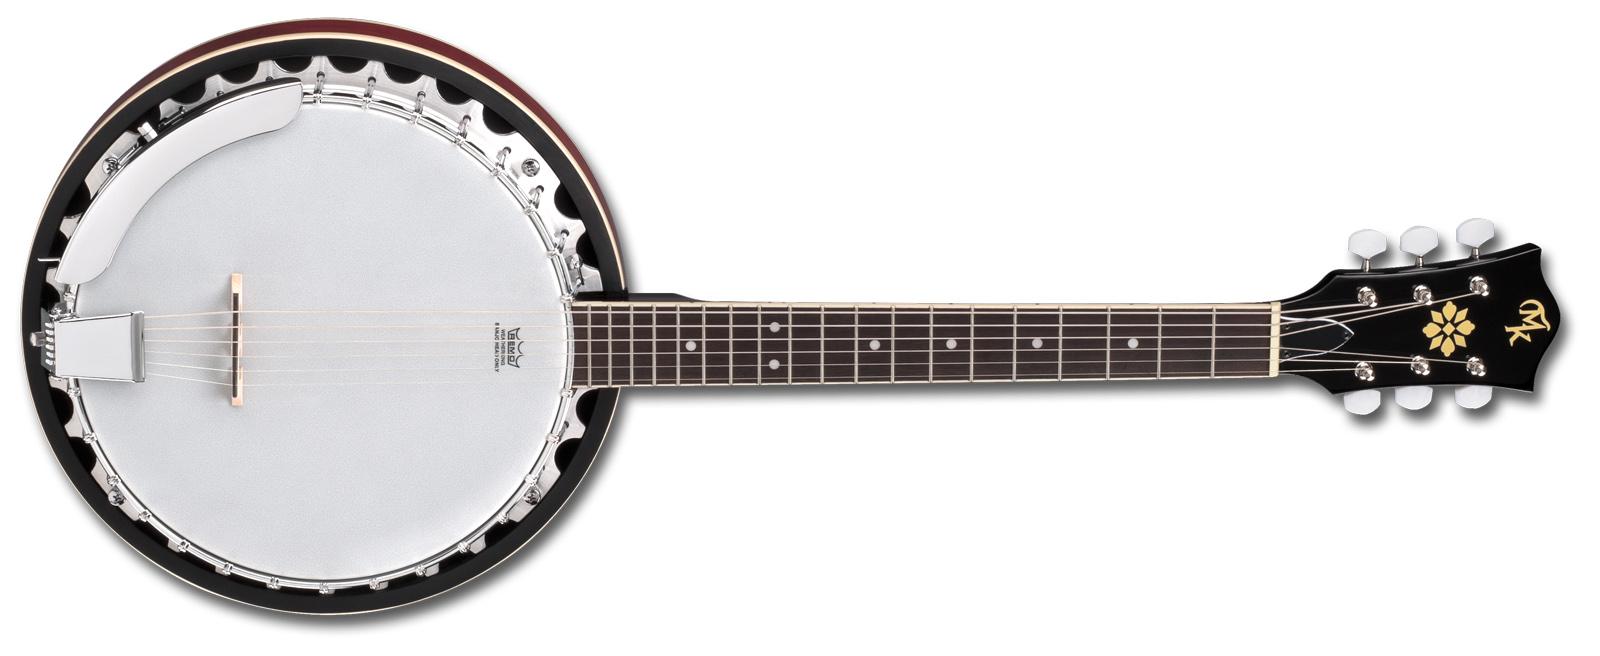 Kief music crafted following. Banjo clipart banjo guitar